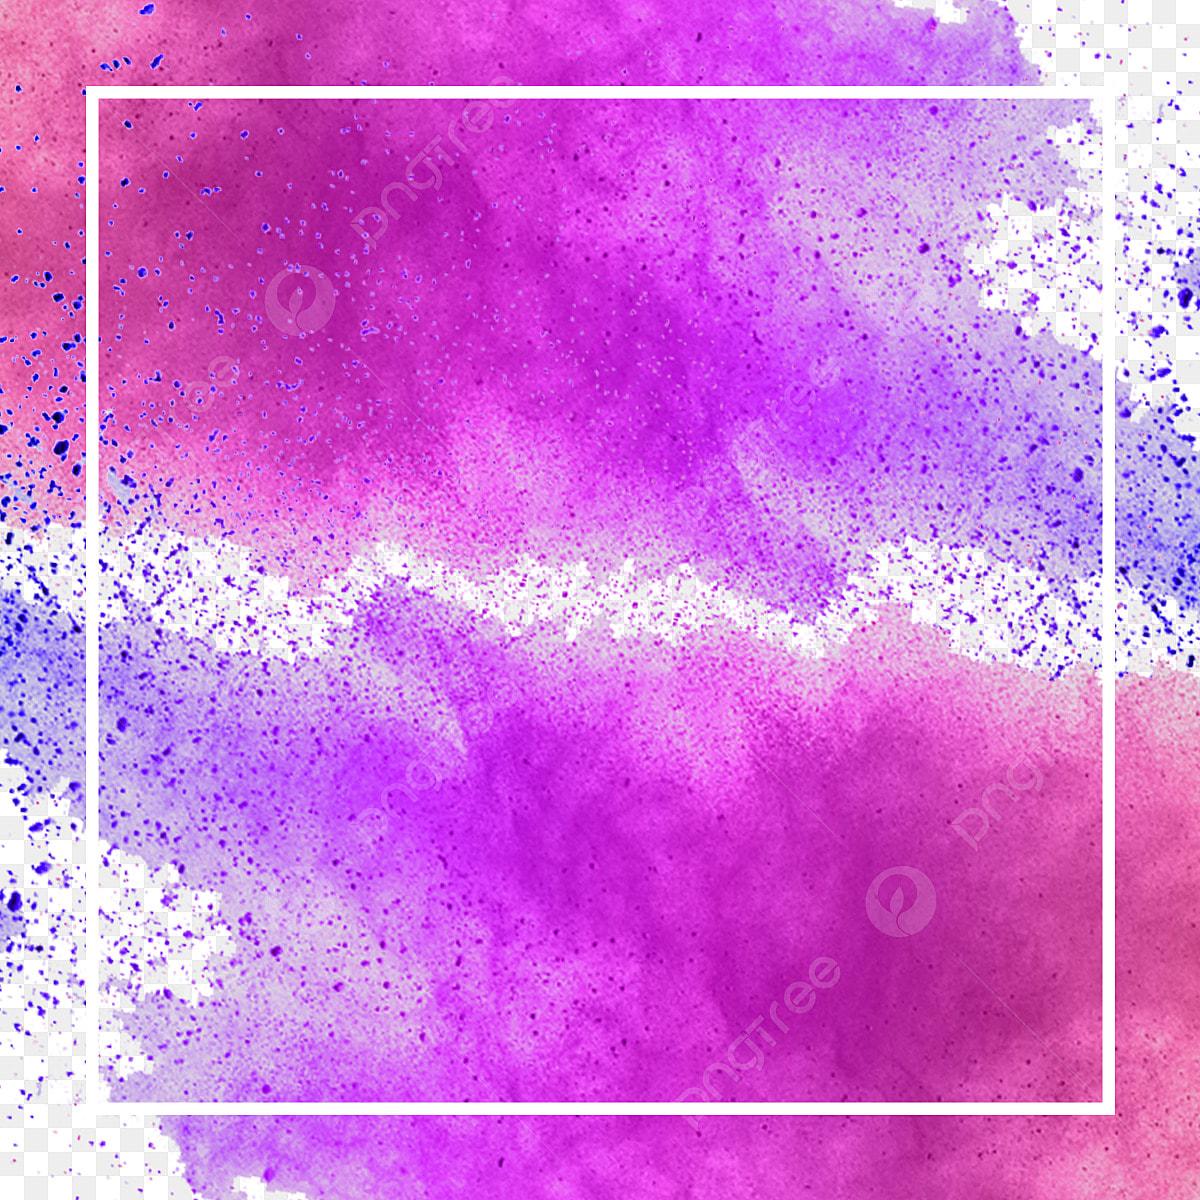 Abstrakter Farbspritzer-Banner, Kurvensymbol, Clipart, Design-Element,  Vektorgrafik Stock-Vektorgrafik (Lizenzfrei) 337935161